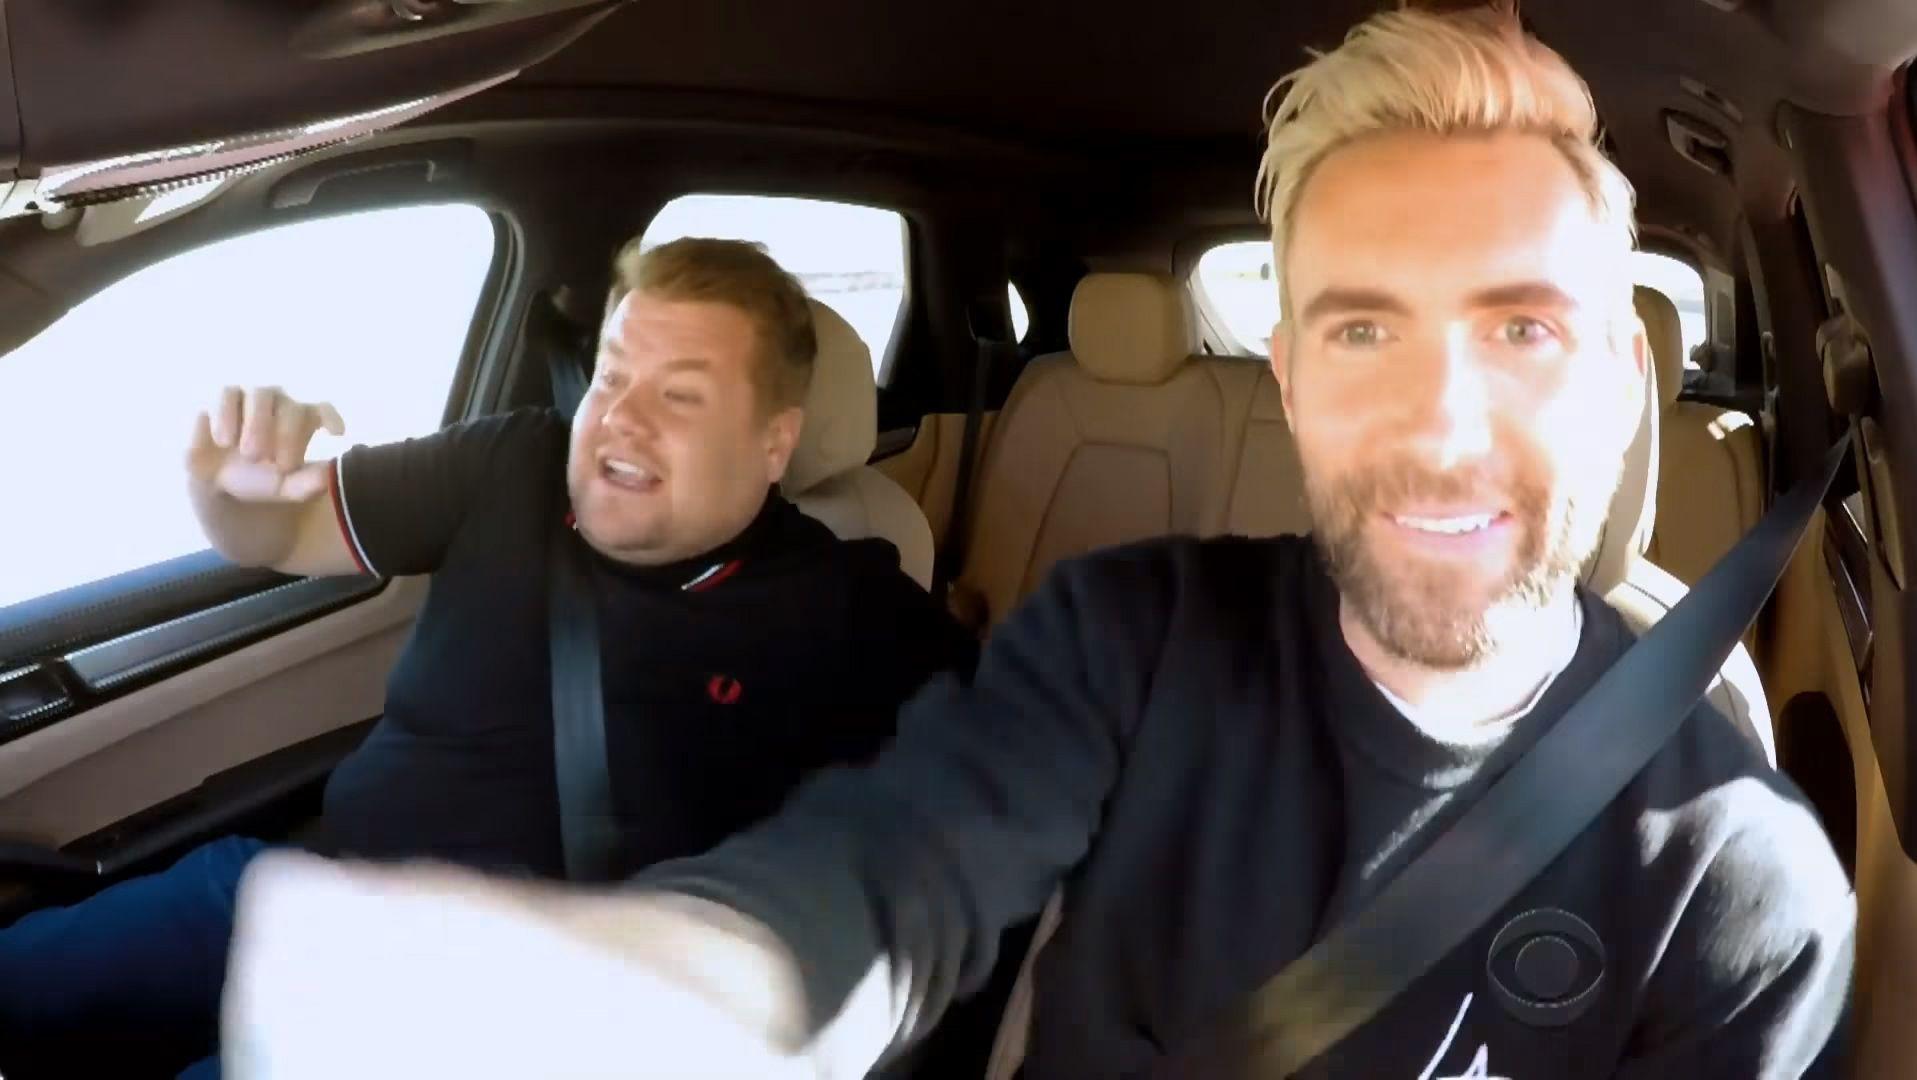 James Cordon isn't a fan of Adam Levine's driving